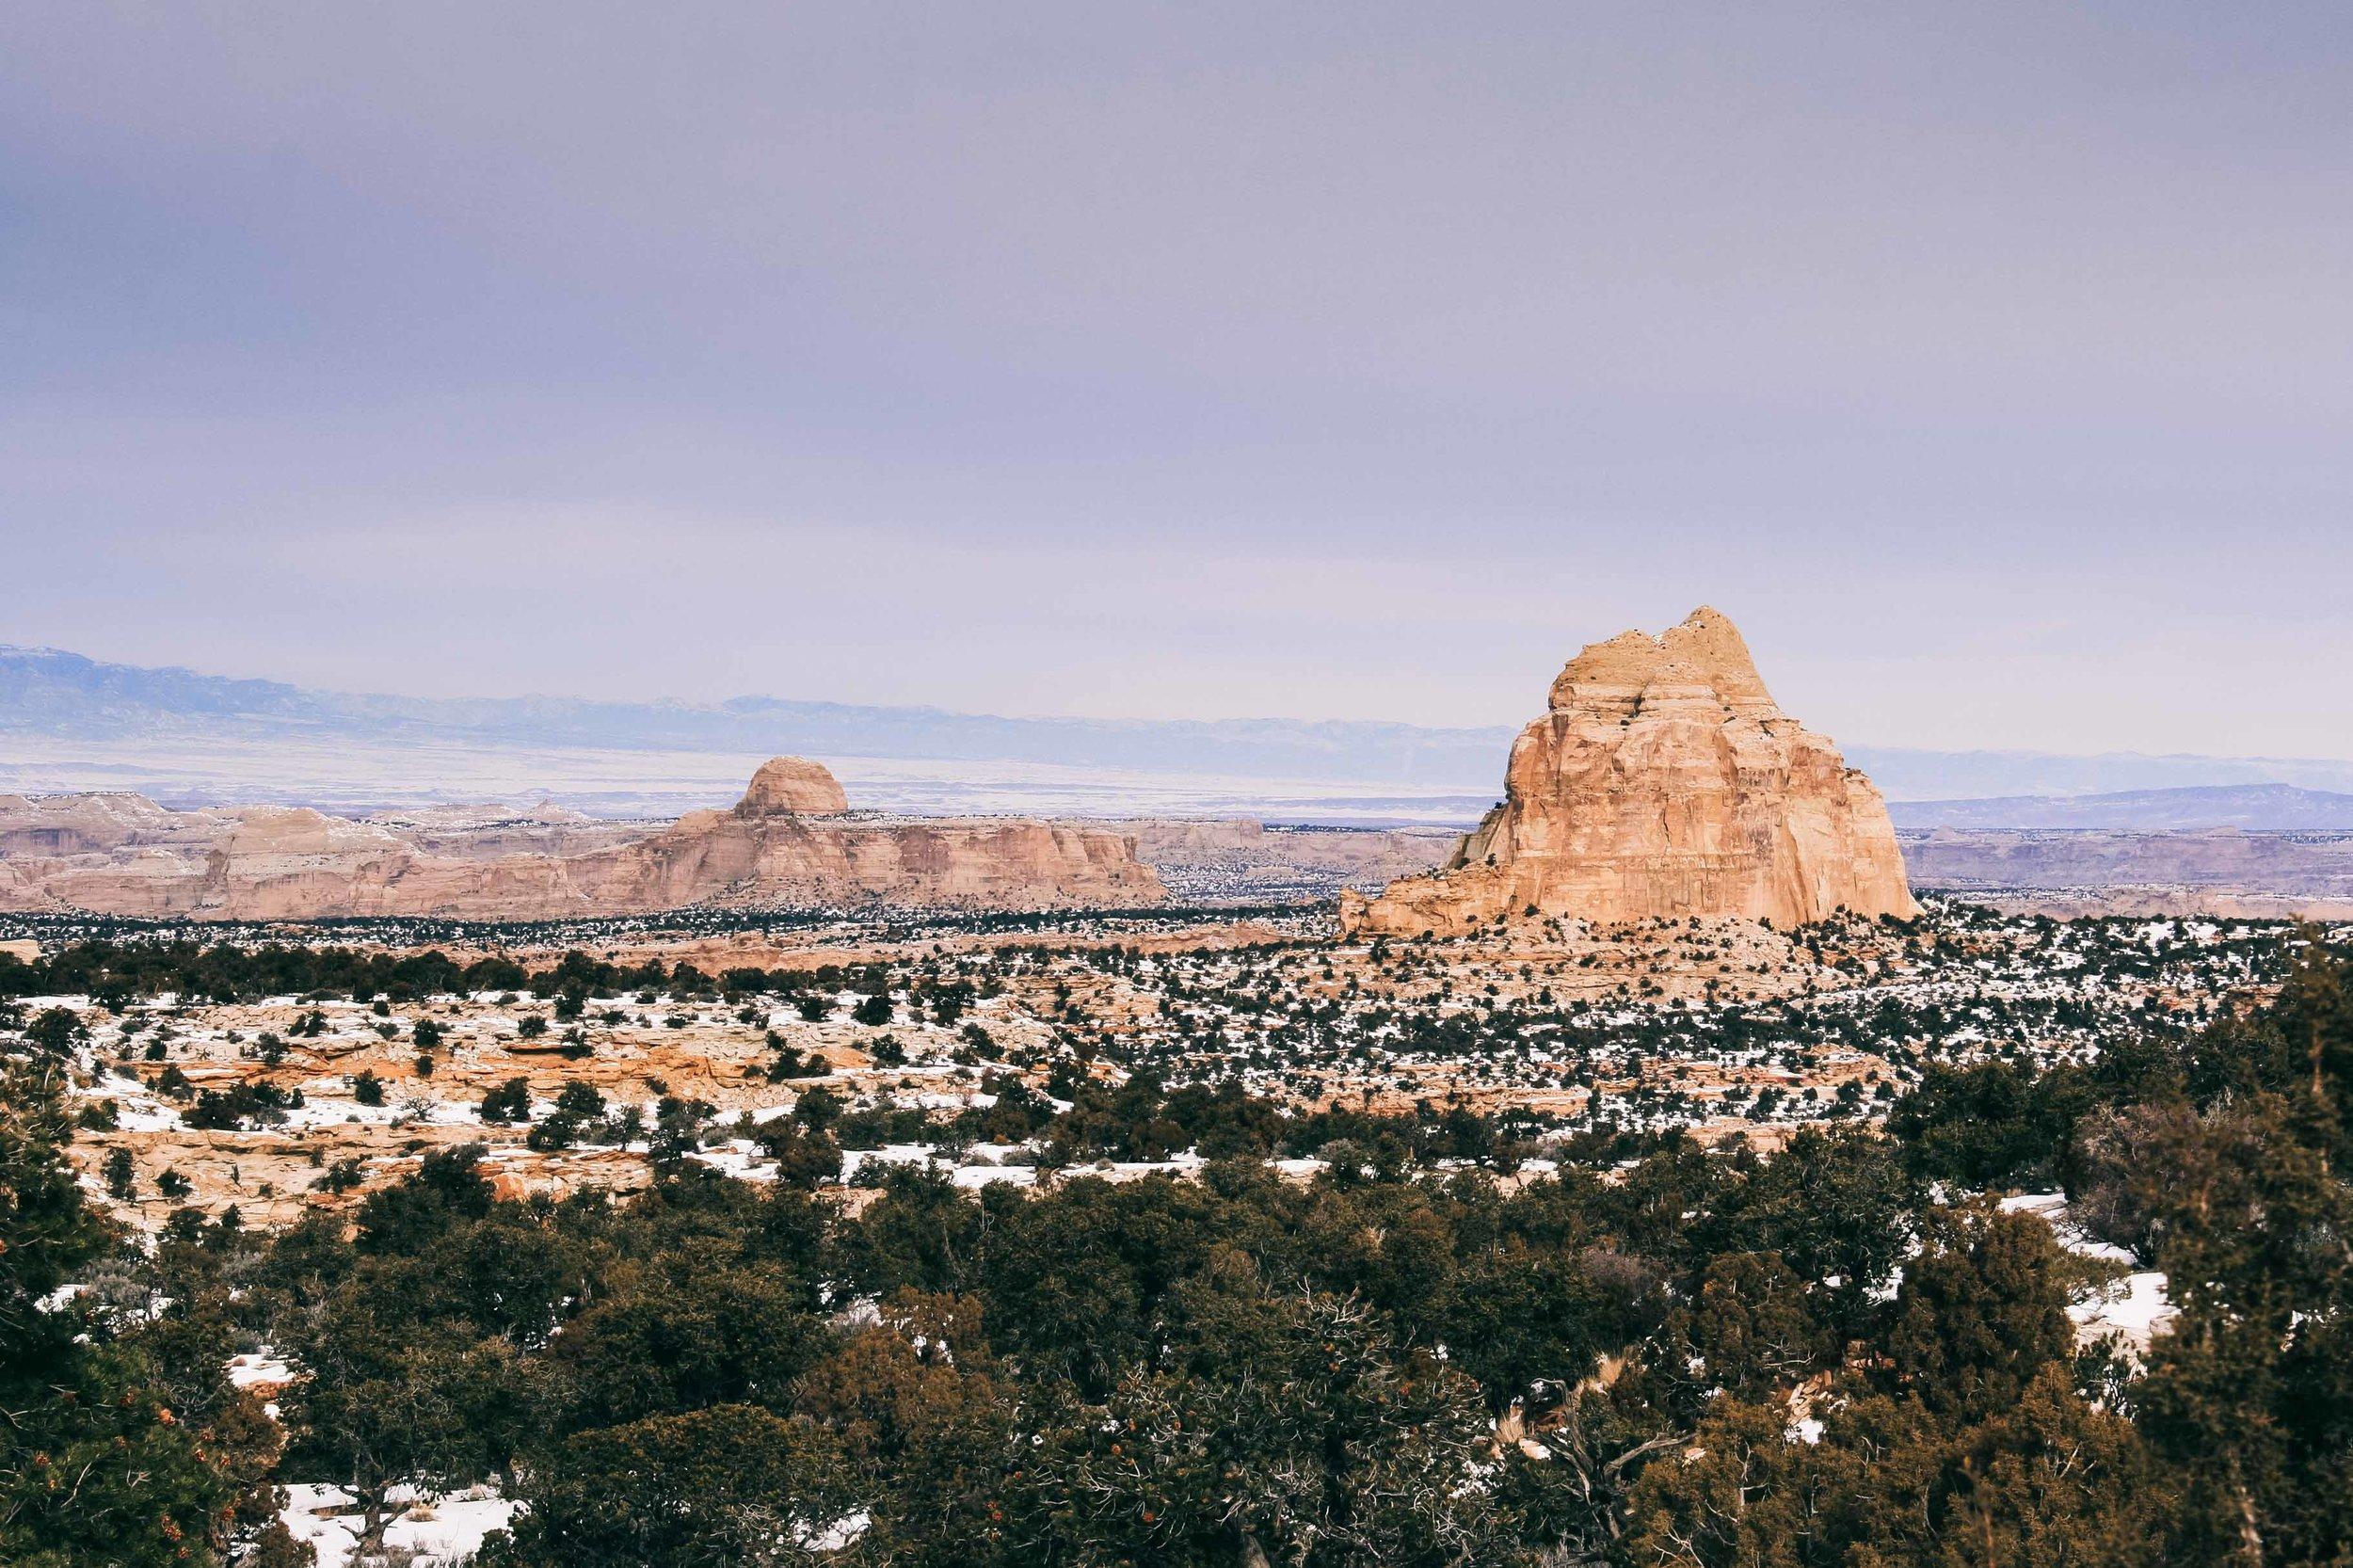 The Badlands and San Rafael Canyon, Utah. January 2013